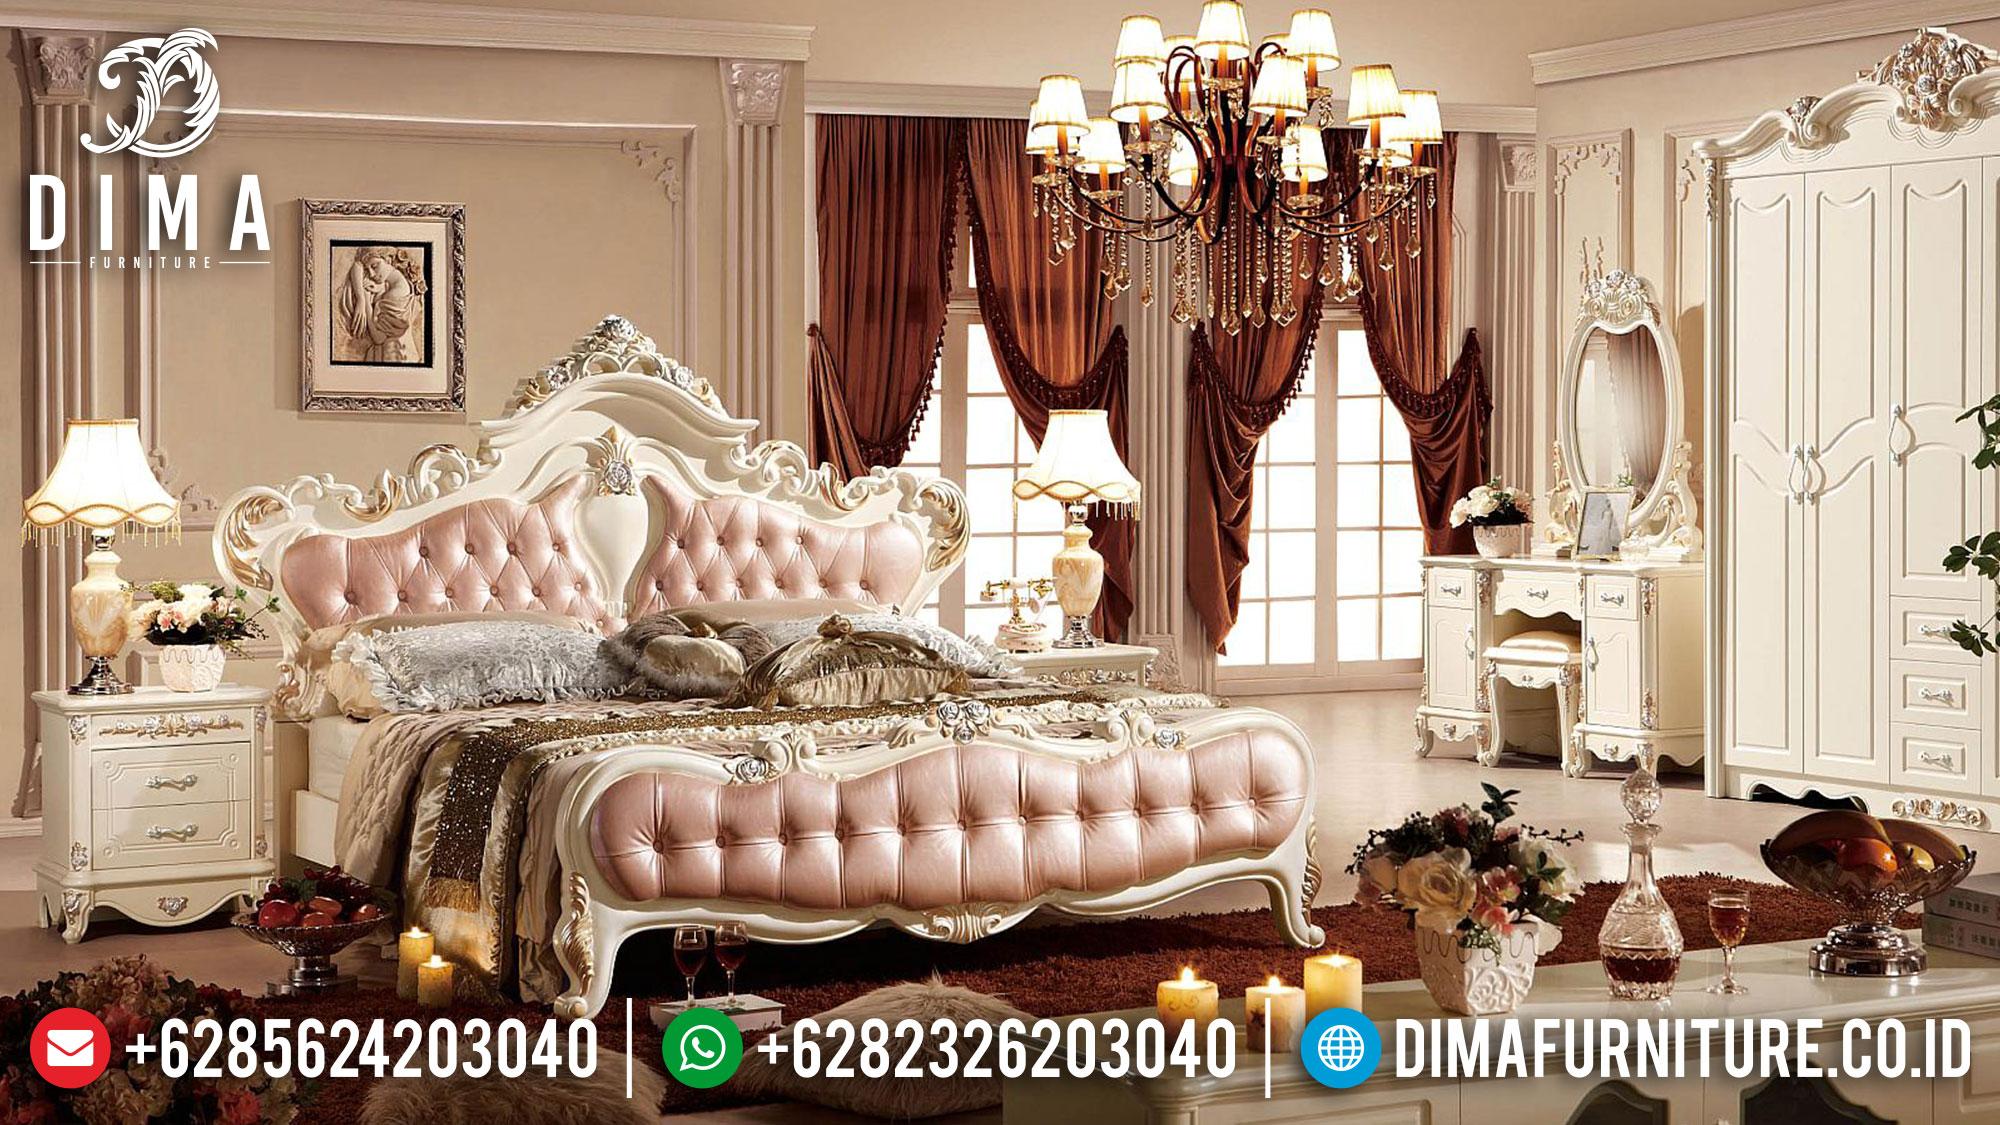 Kamar Set Mewah Ukir Jepara Luxury Baroque Style Great Quality Item ST-1143